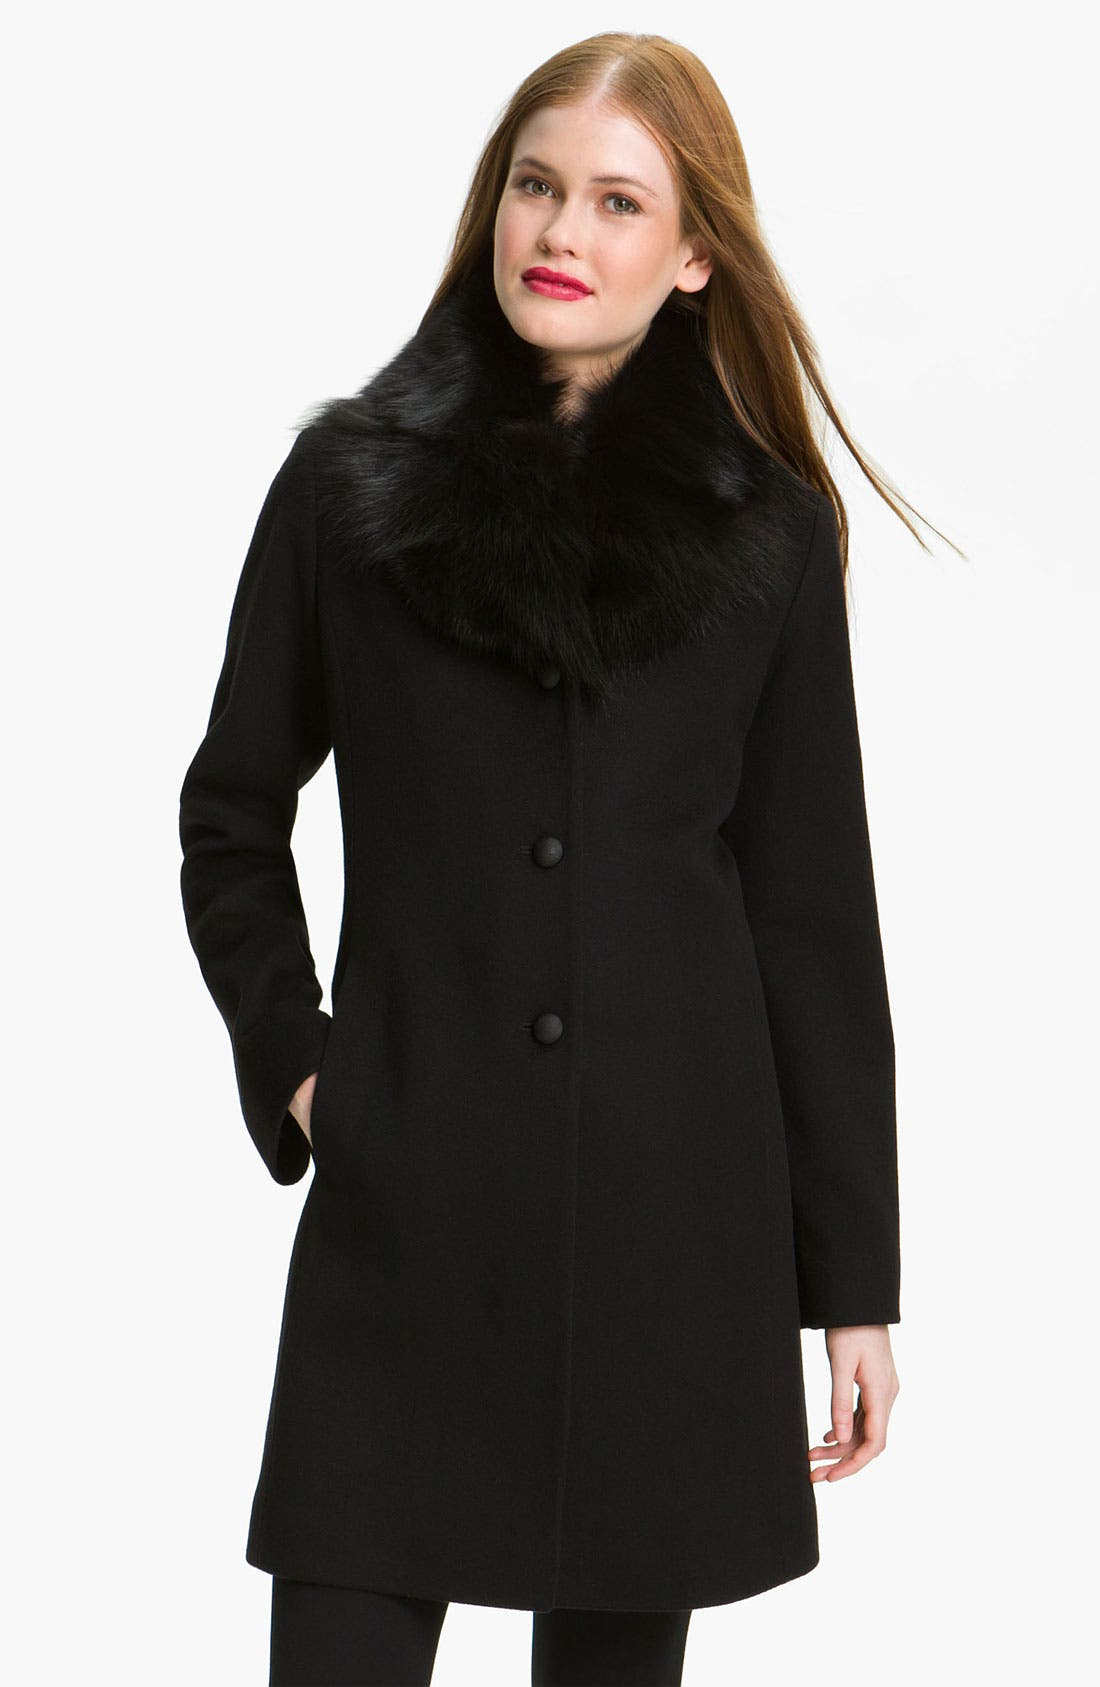 Alternate Image 1 Selected - Fleurette Loro Piana Wool Coat with Genuine Fox Fur (Online Exclusive)